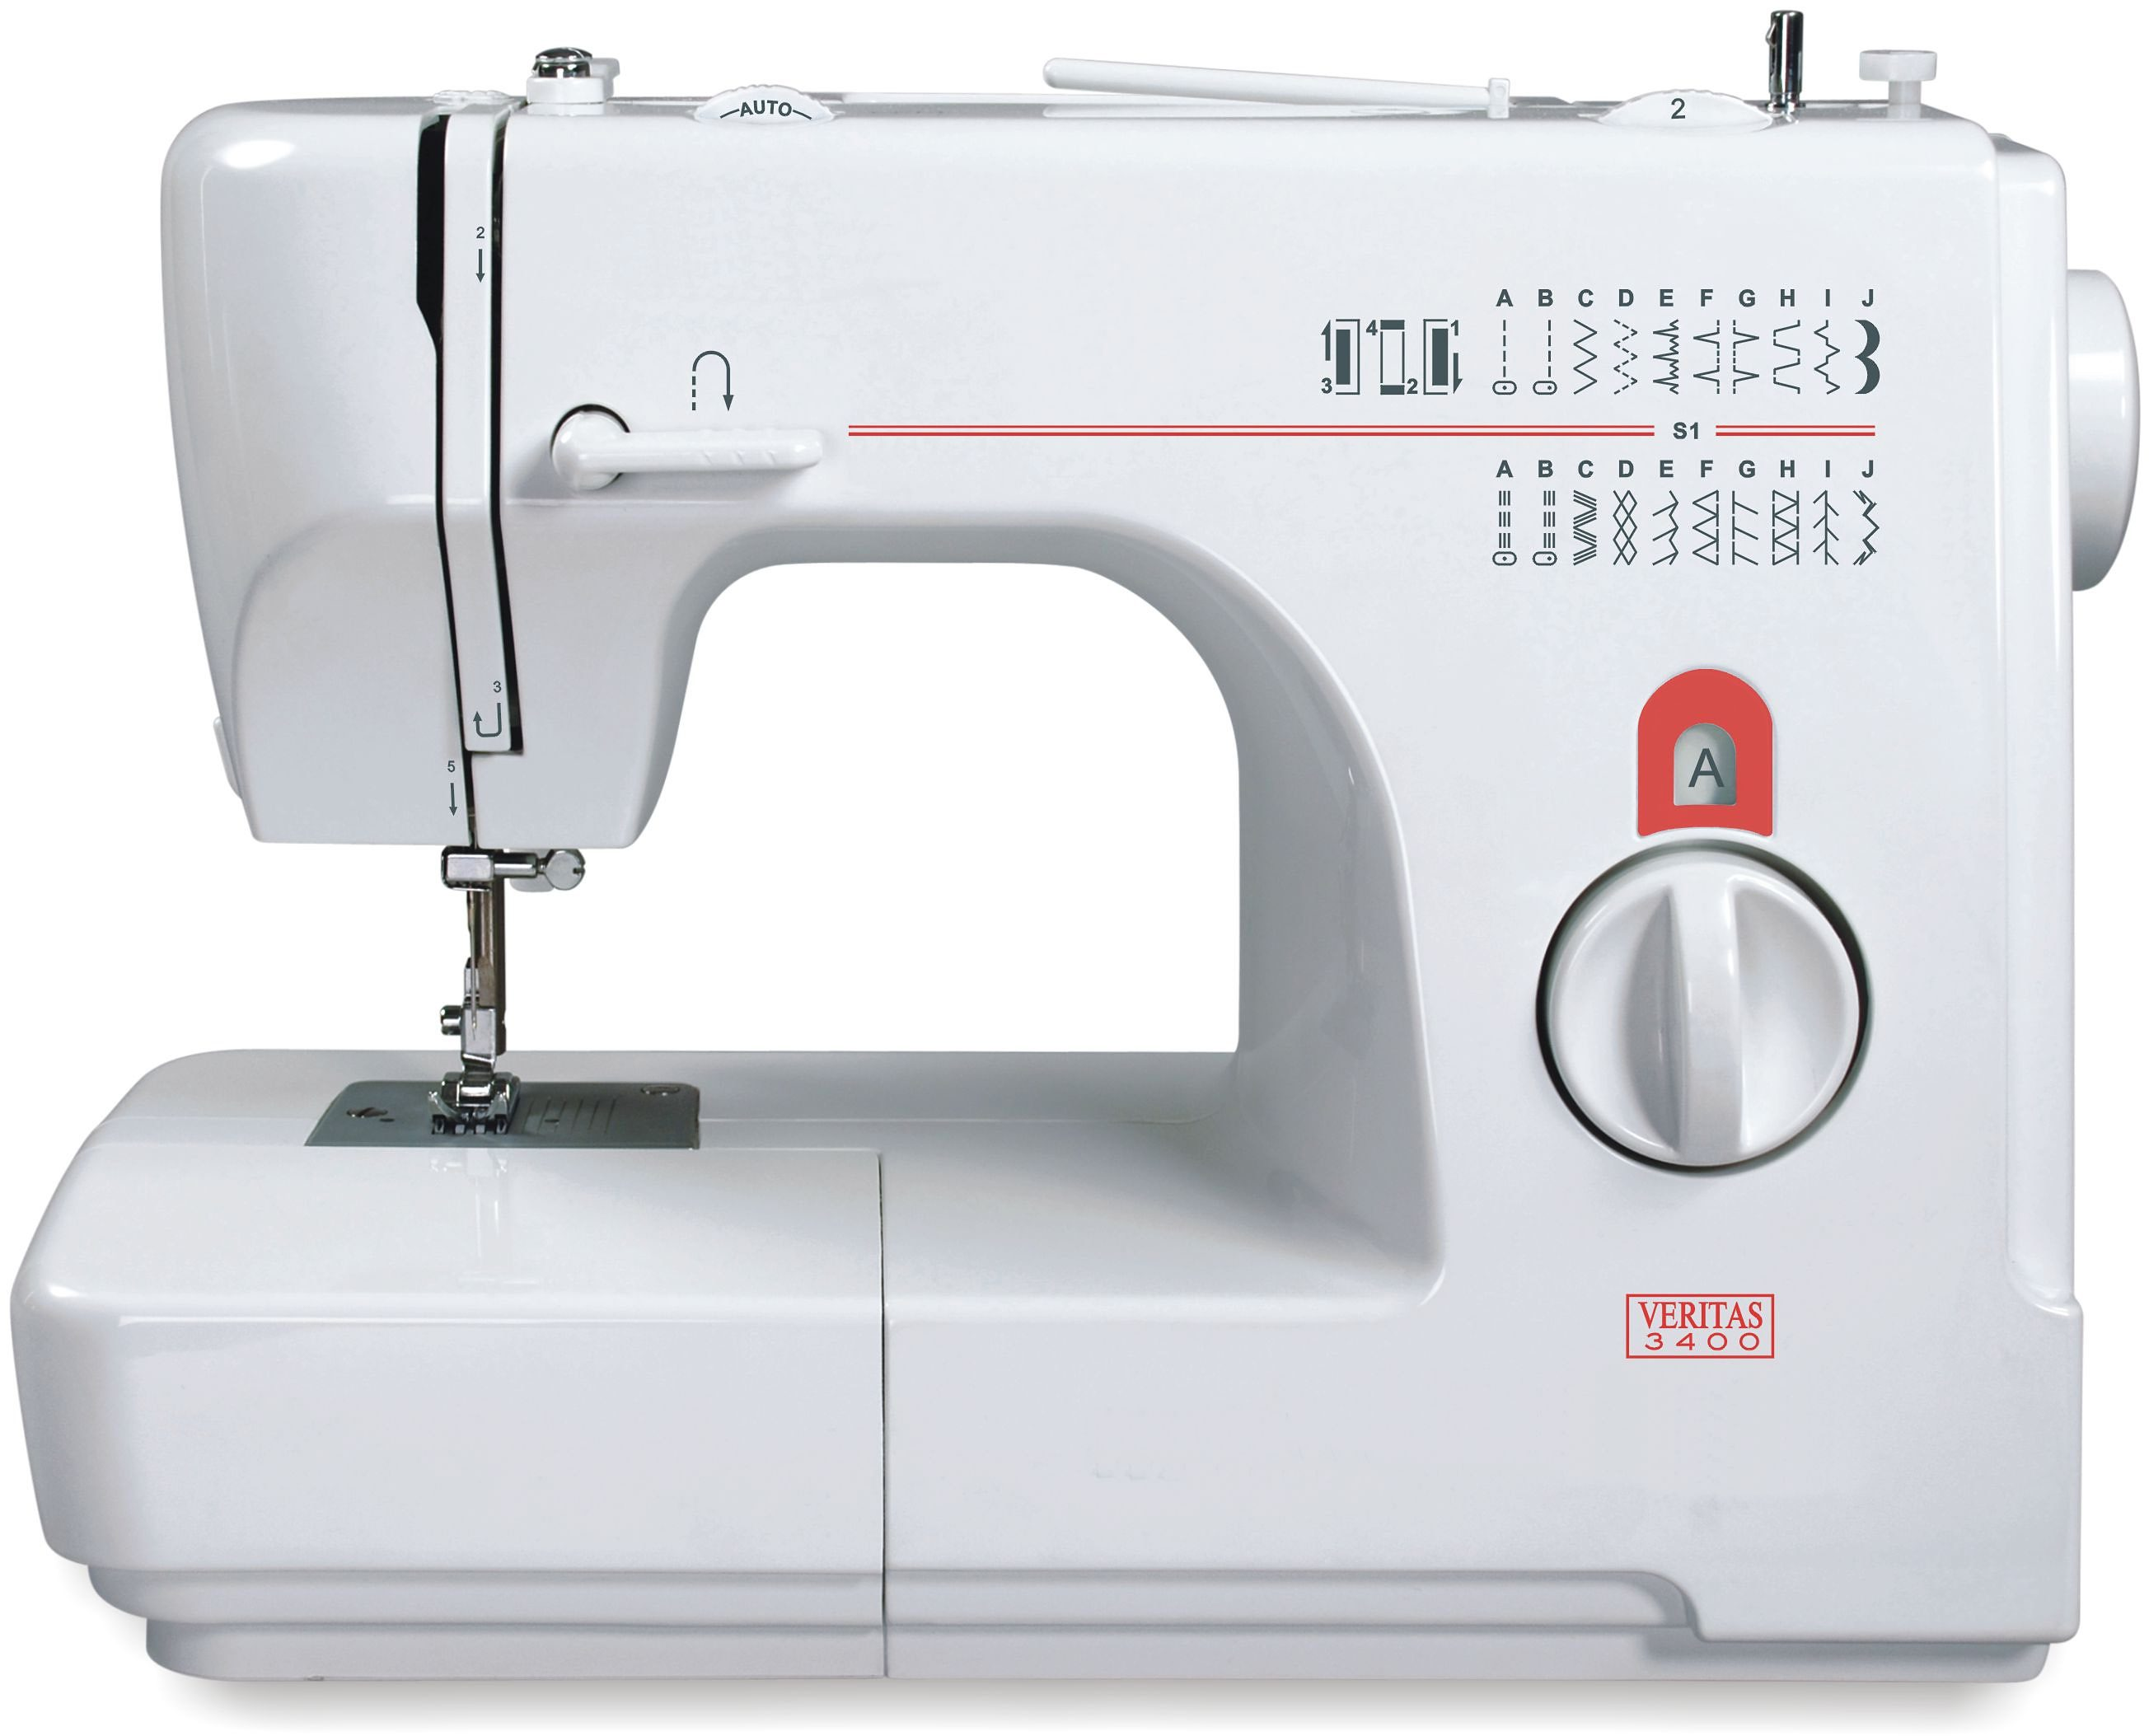 Veritas Nähmaschine 3400, 24 Stichprogramme, 4-stufige Knopflochautomatik